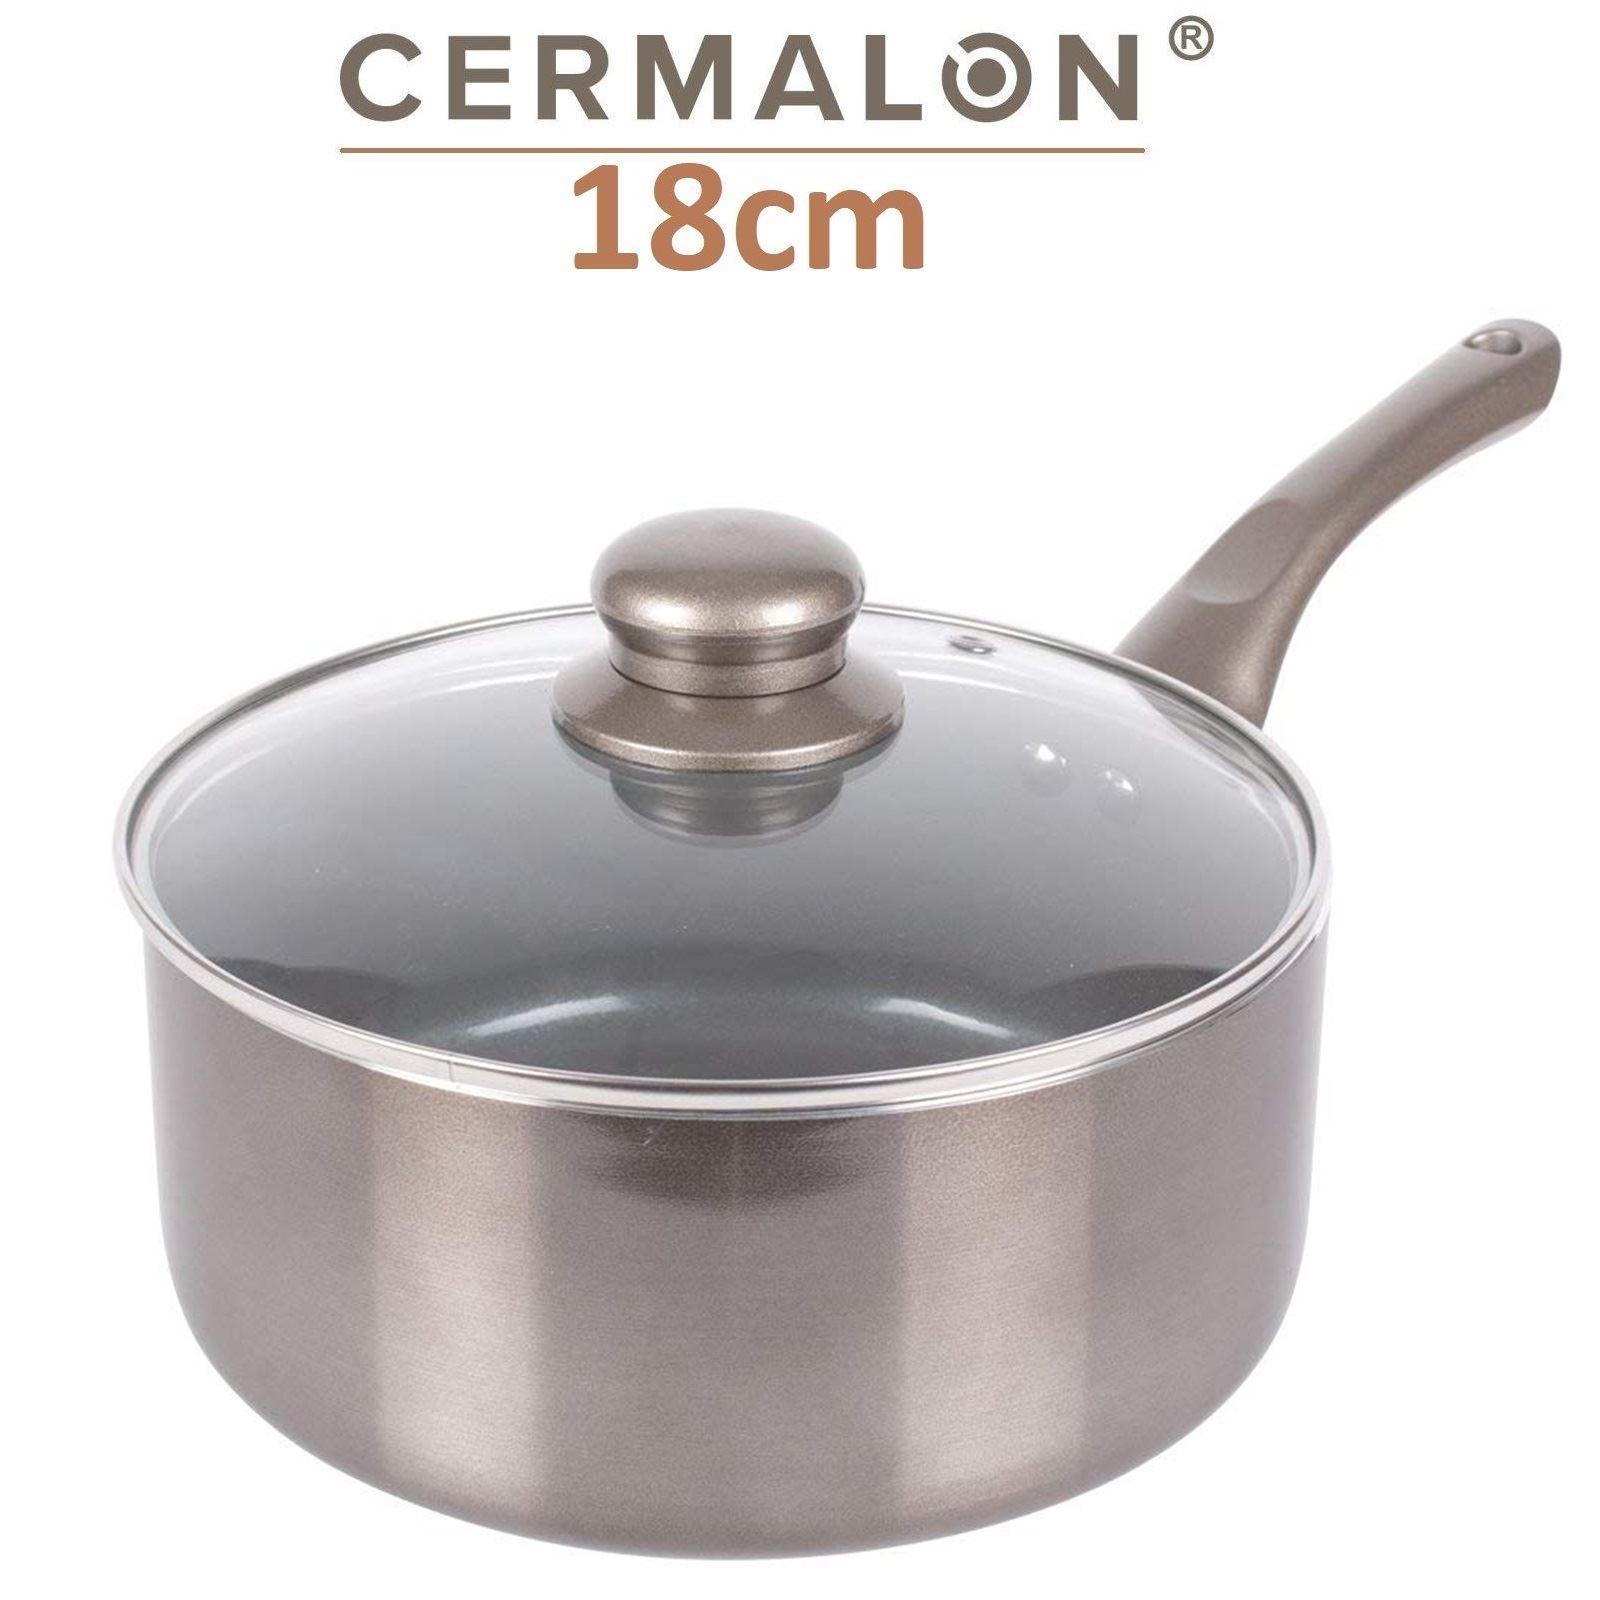 Cermalon Induction Non Stick Saucepan Frying Fry Milk Pan